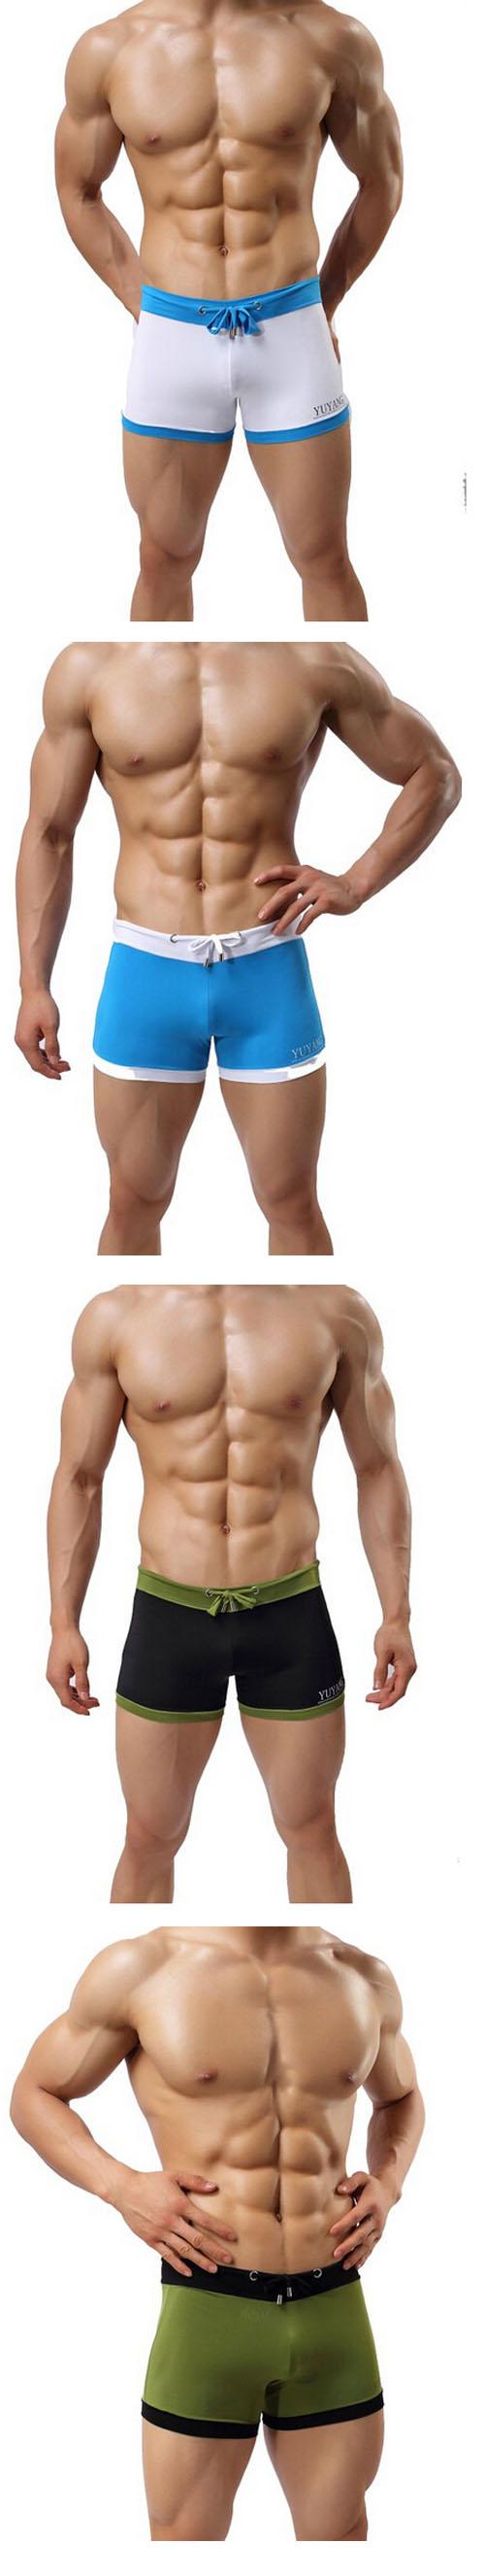 2015 Donyan Solid Slim Sexy Solid Beach Swim Surfing Trunks